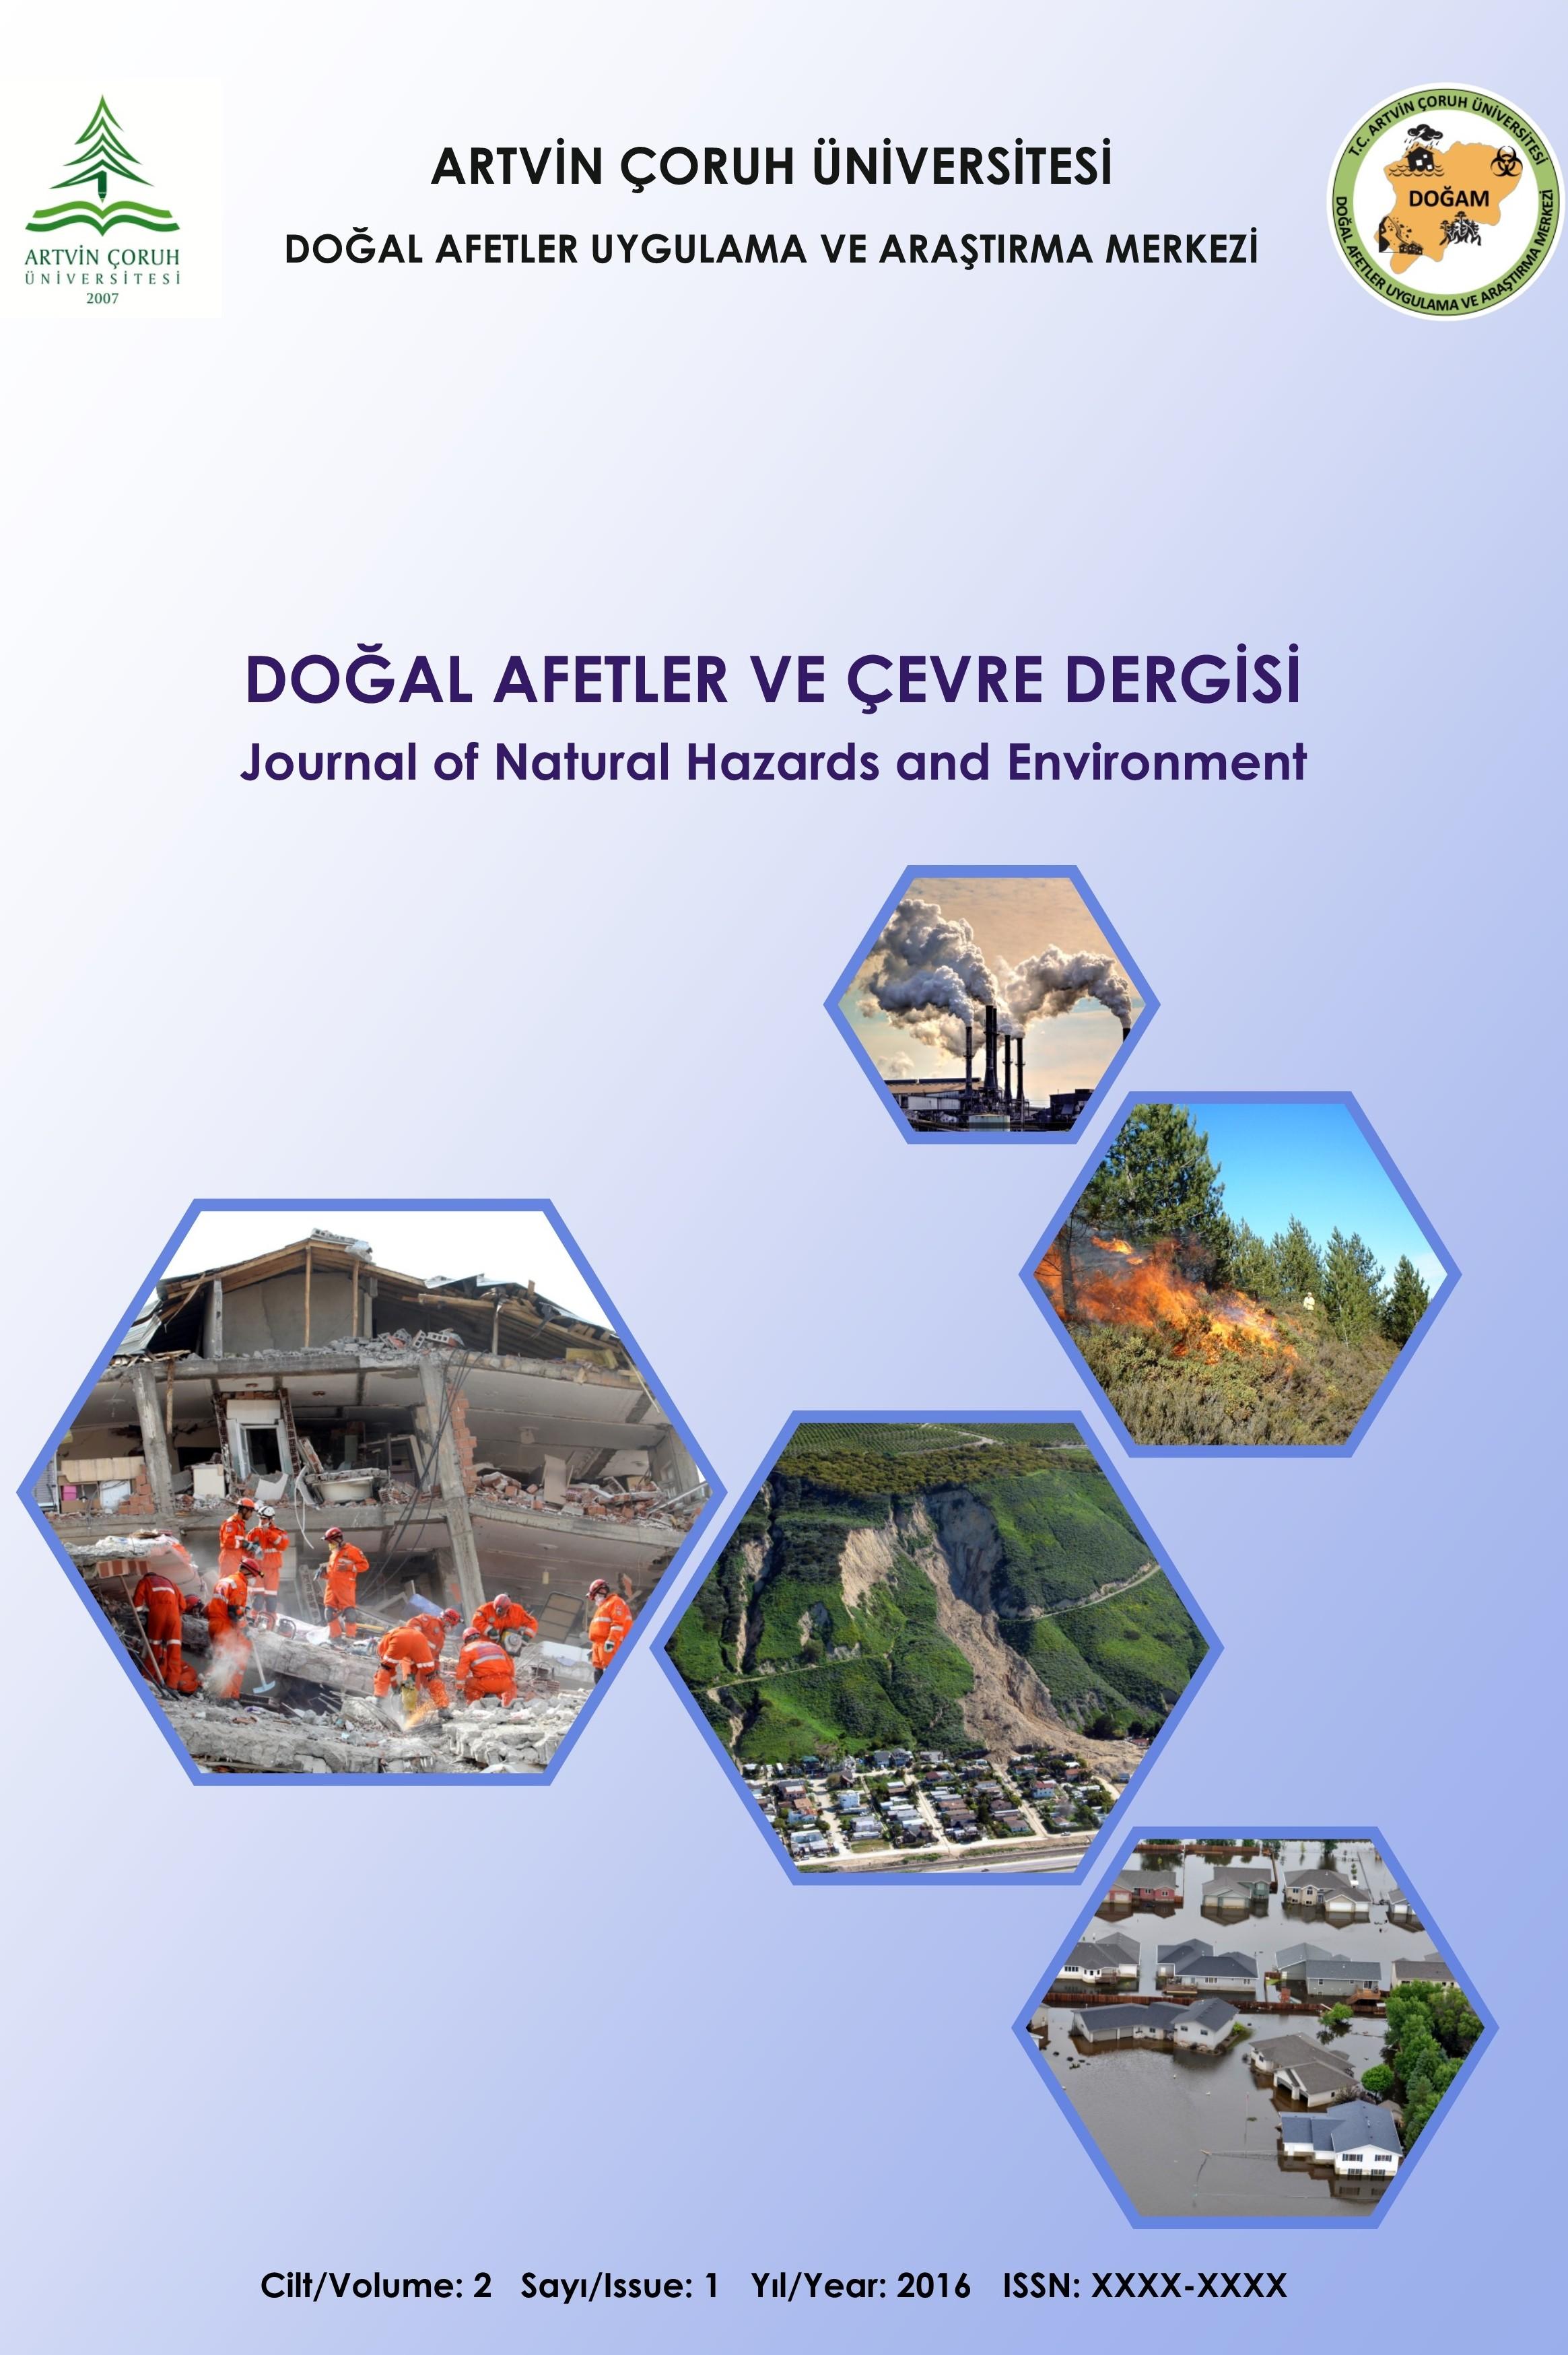 Doğal Afetler ve Çevre Dergisi